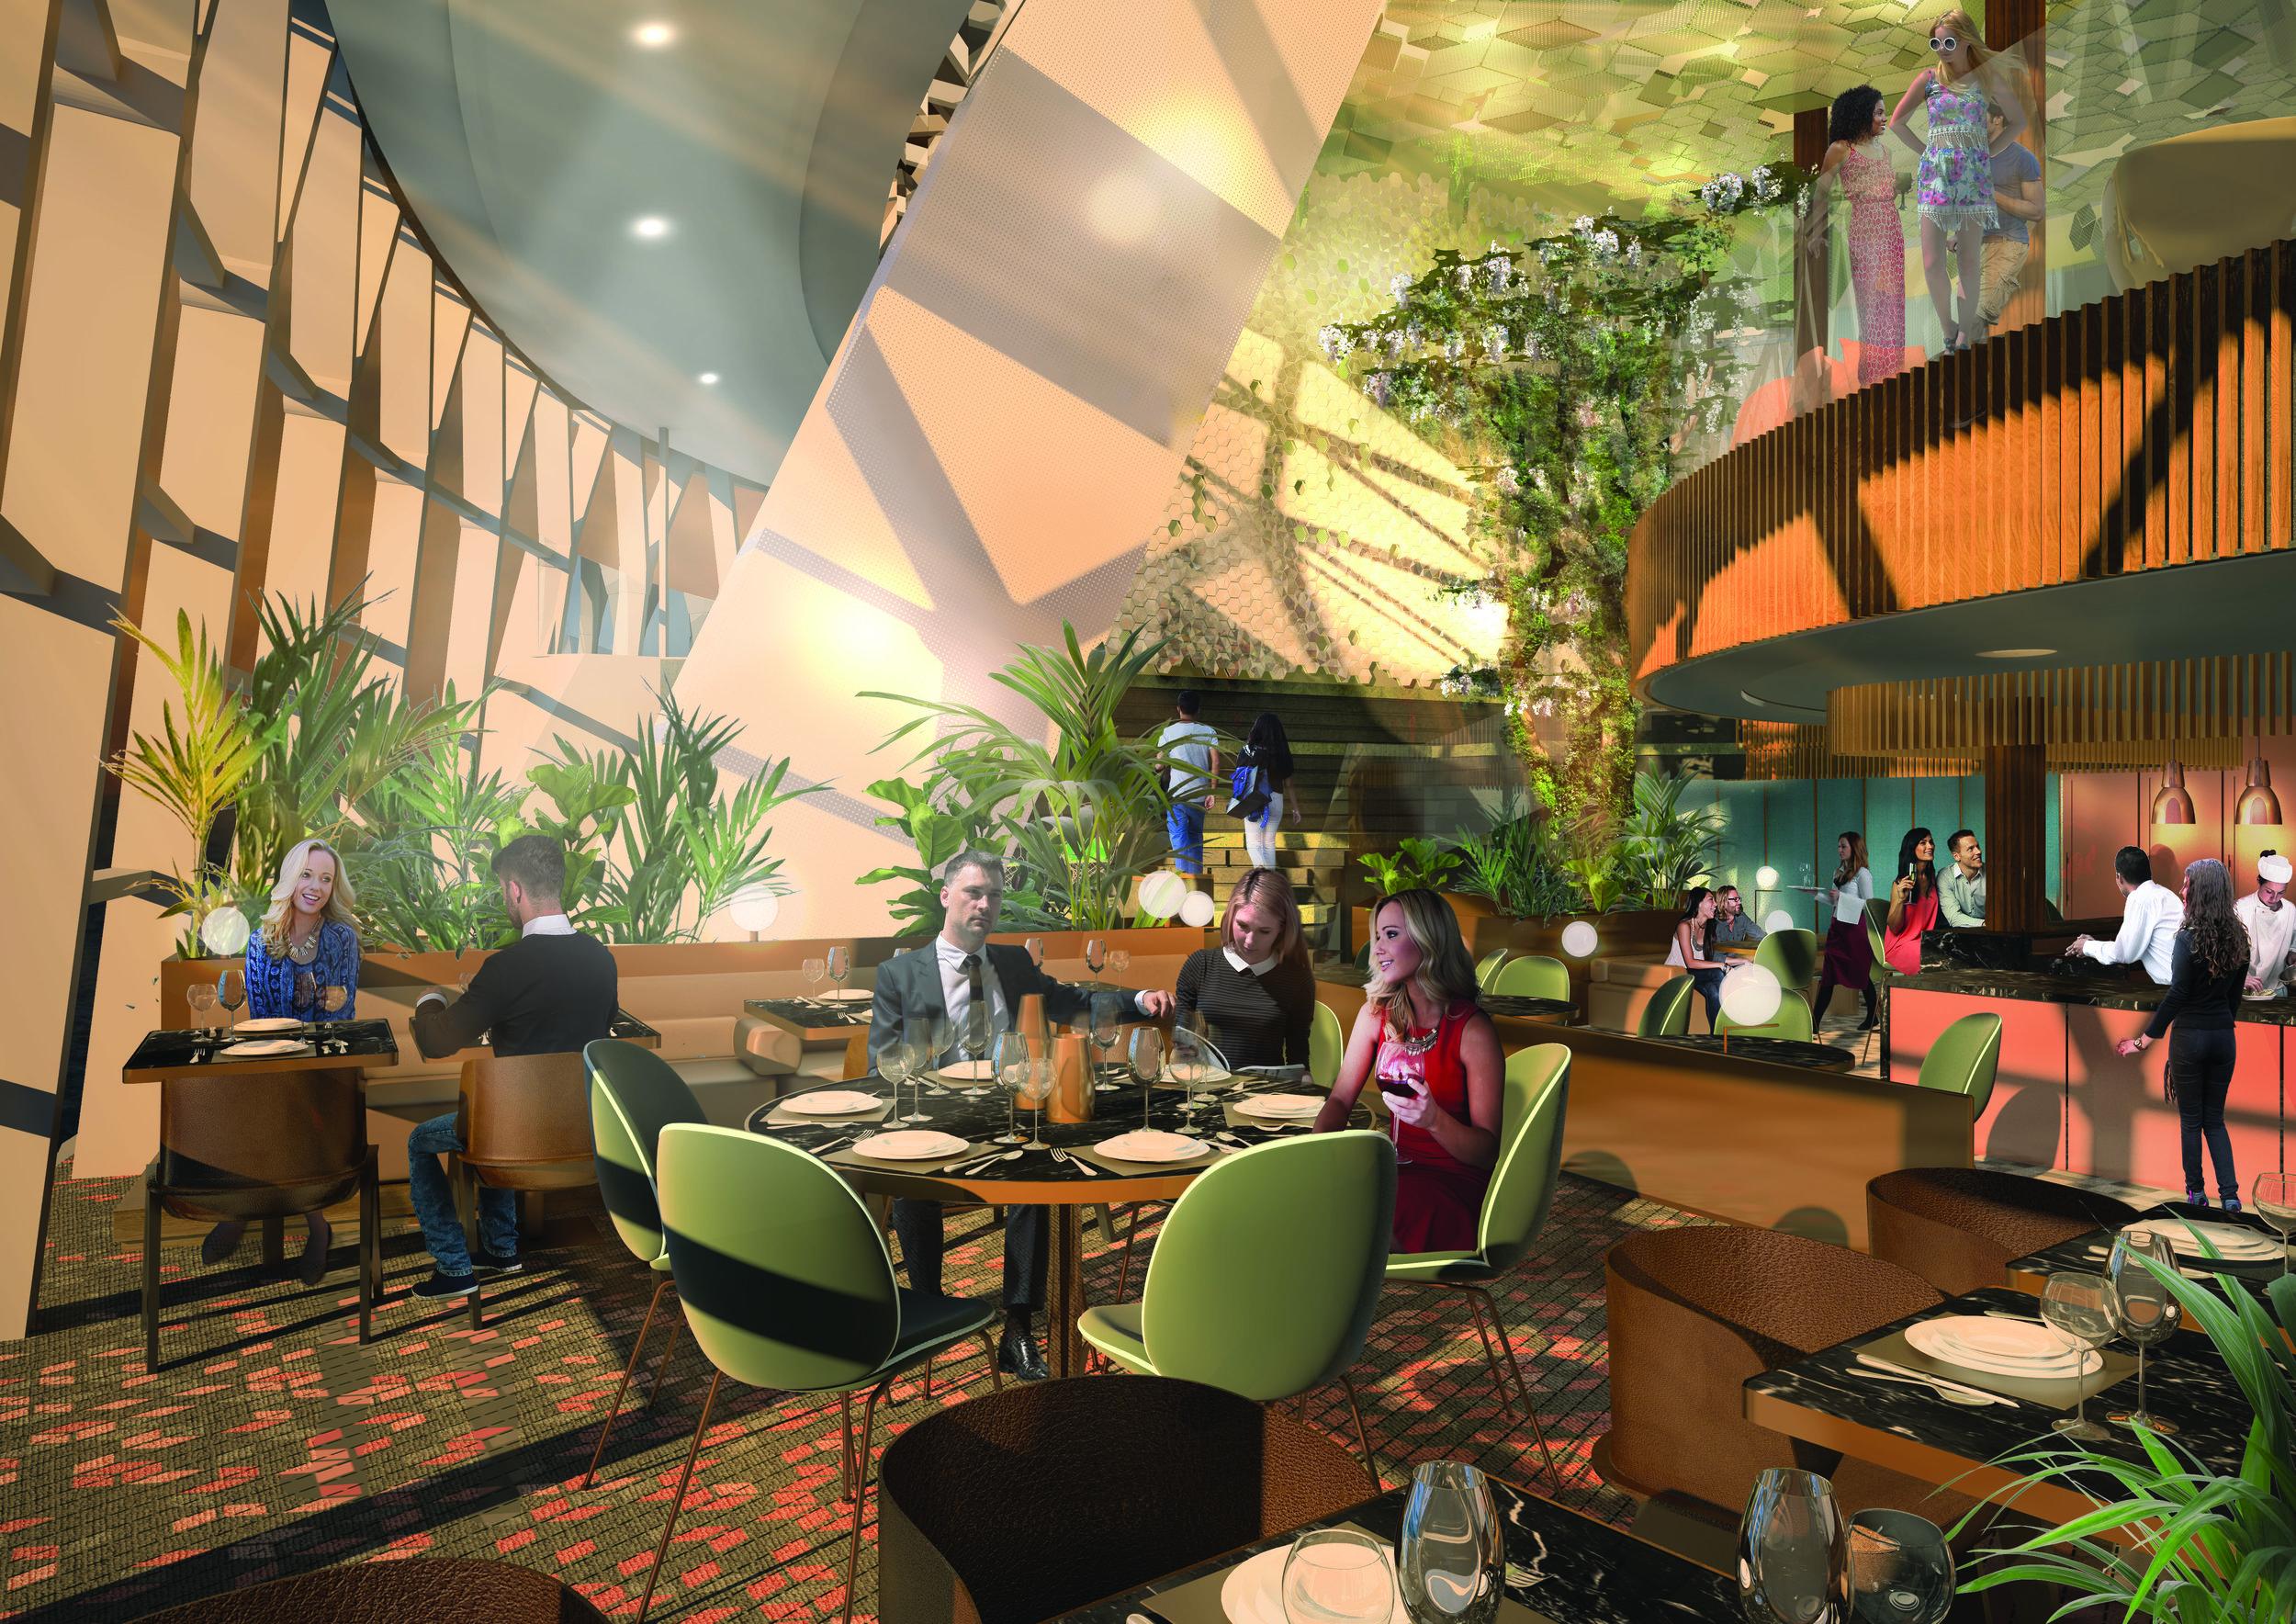 1498587794_5-Eden-restaurant-1-night.jpg